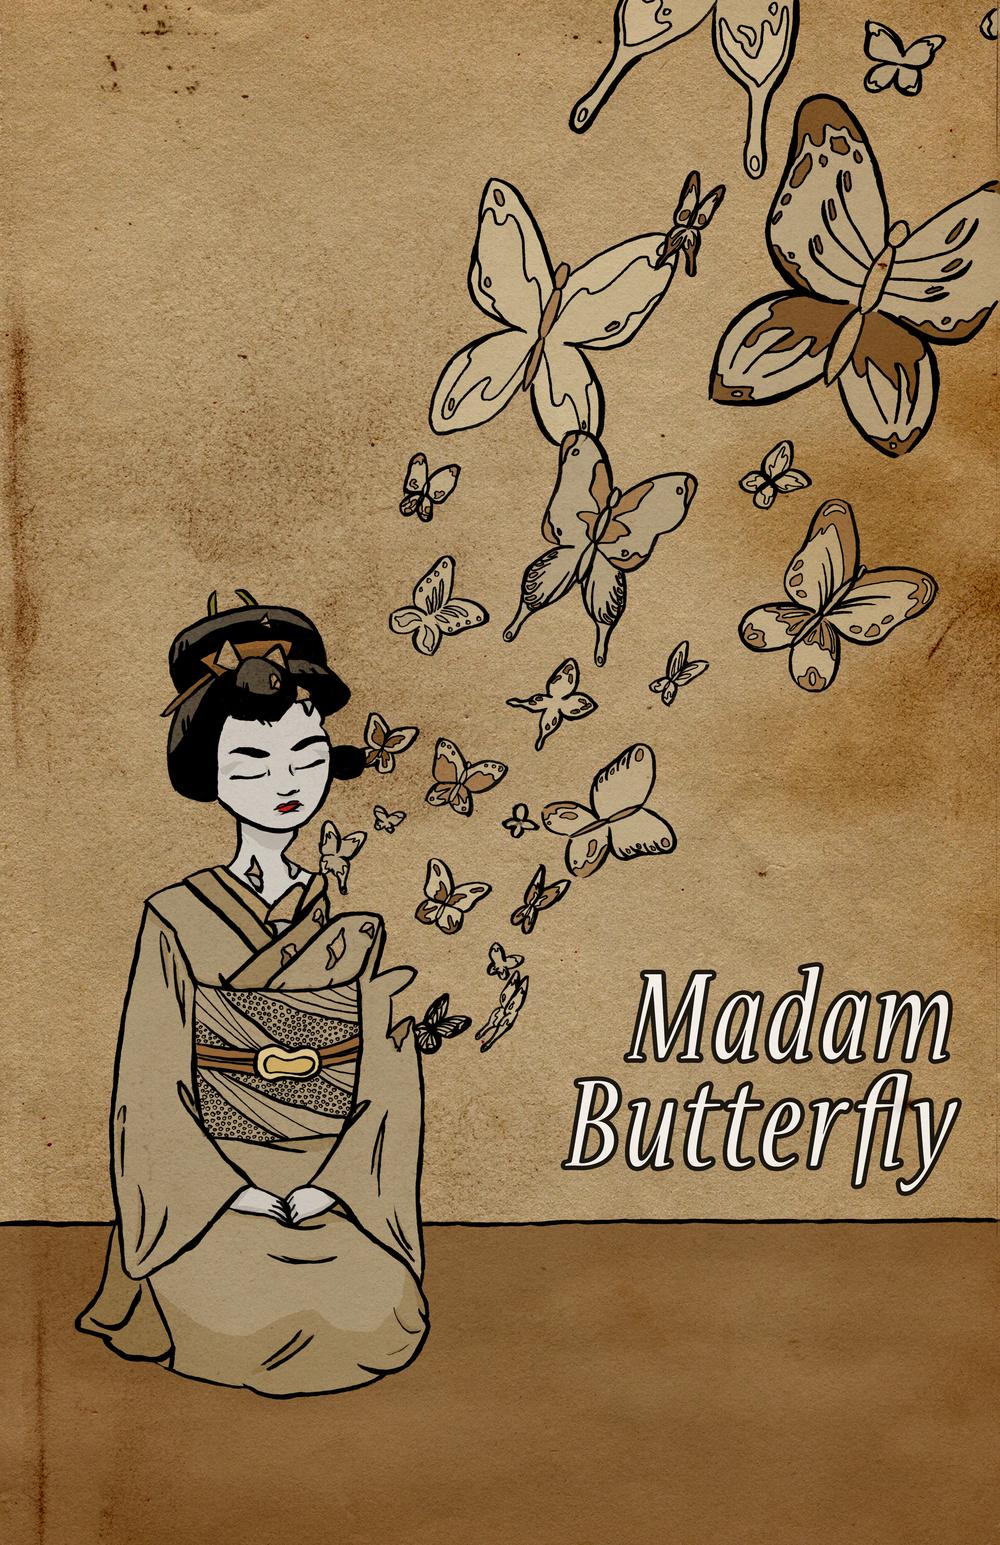 madambutterfly.png